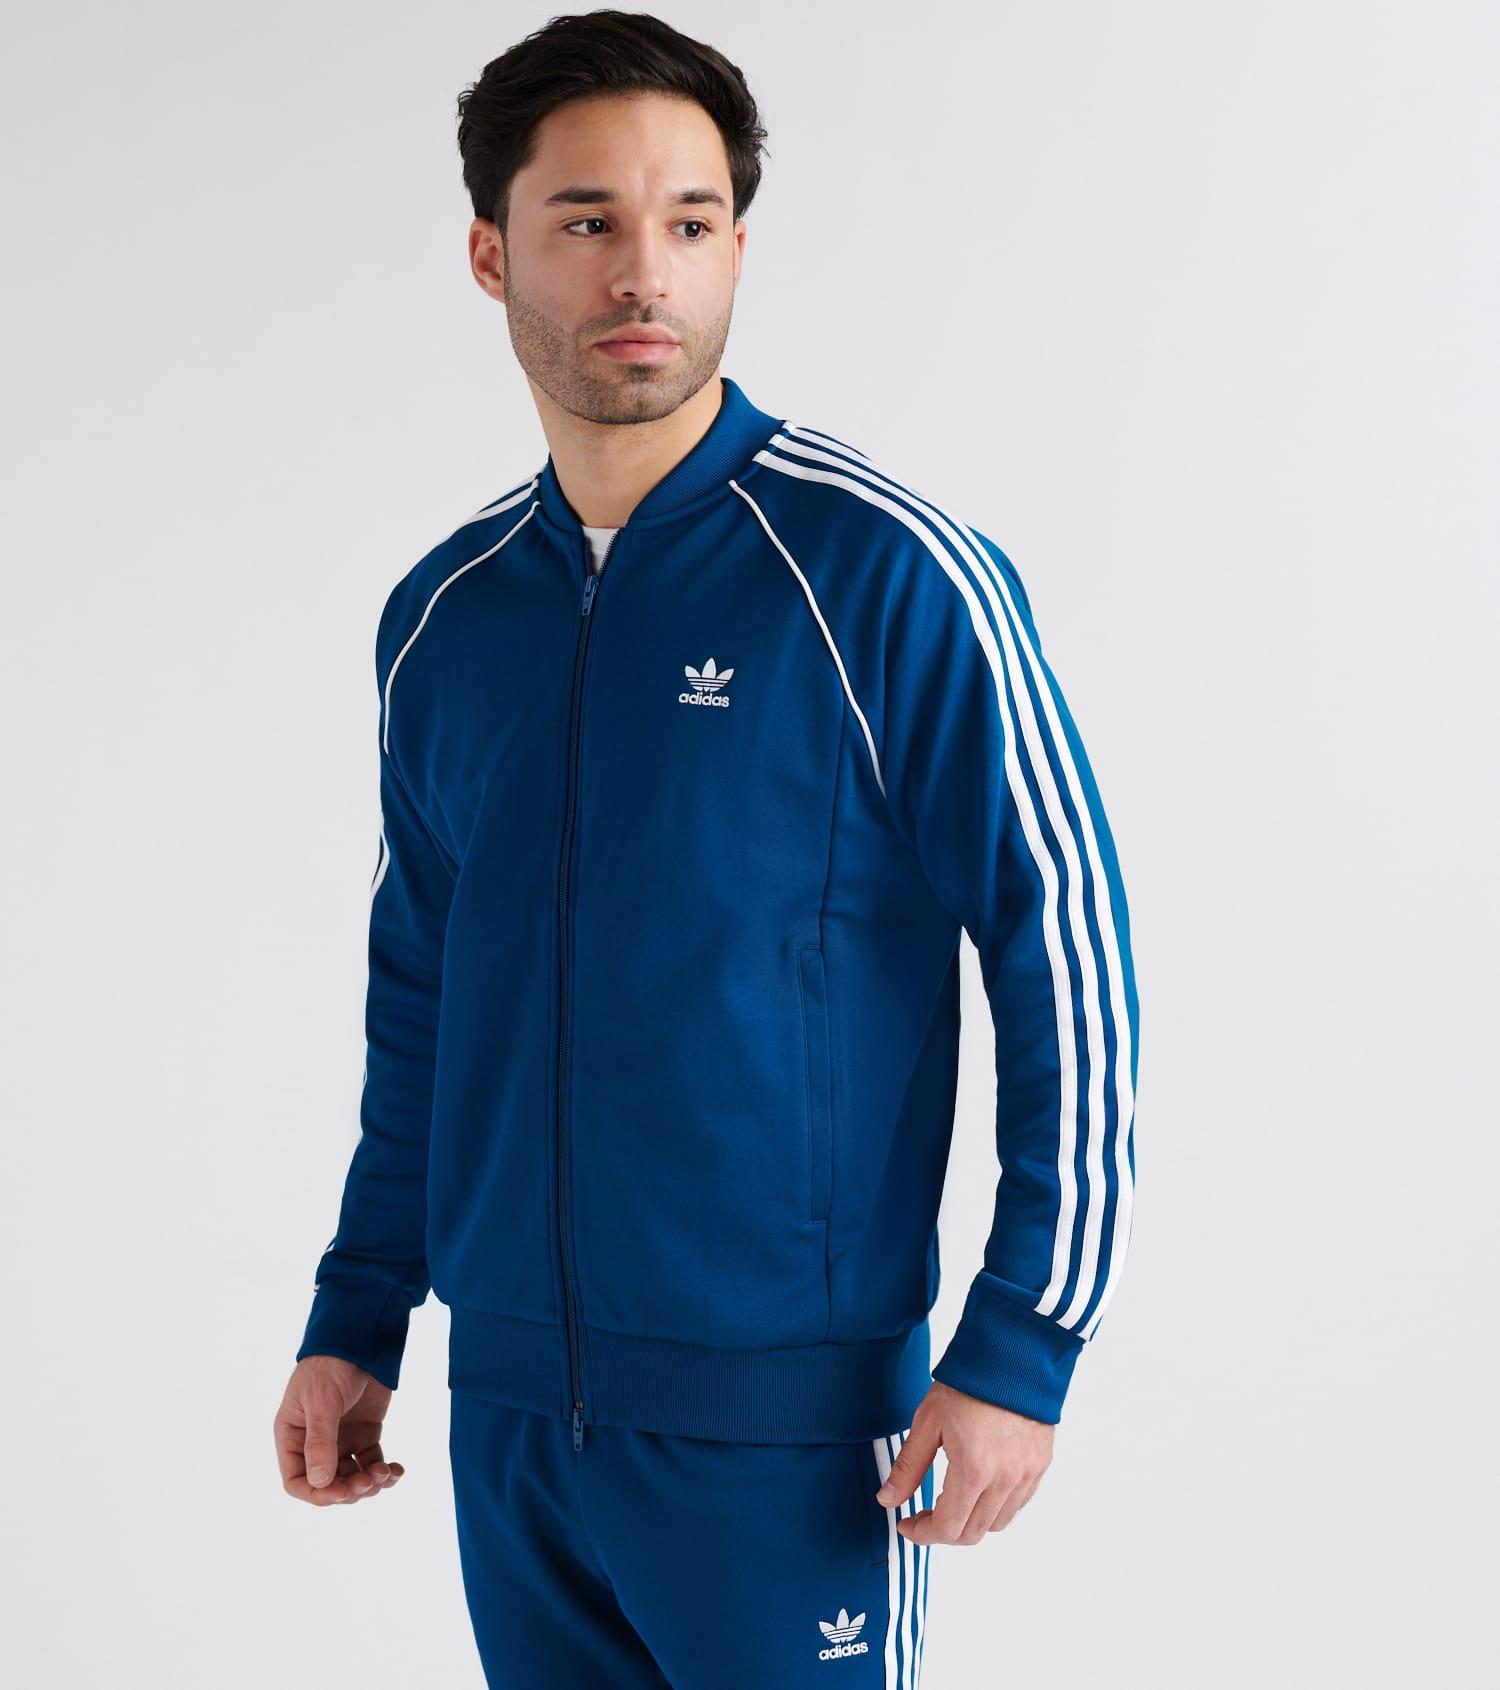 Adidas Superstar Blau Outfit bih